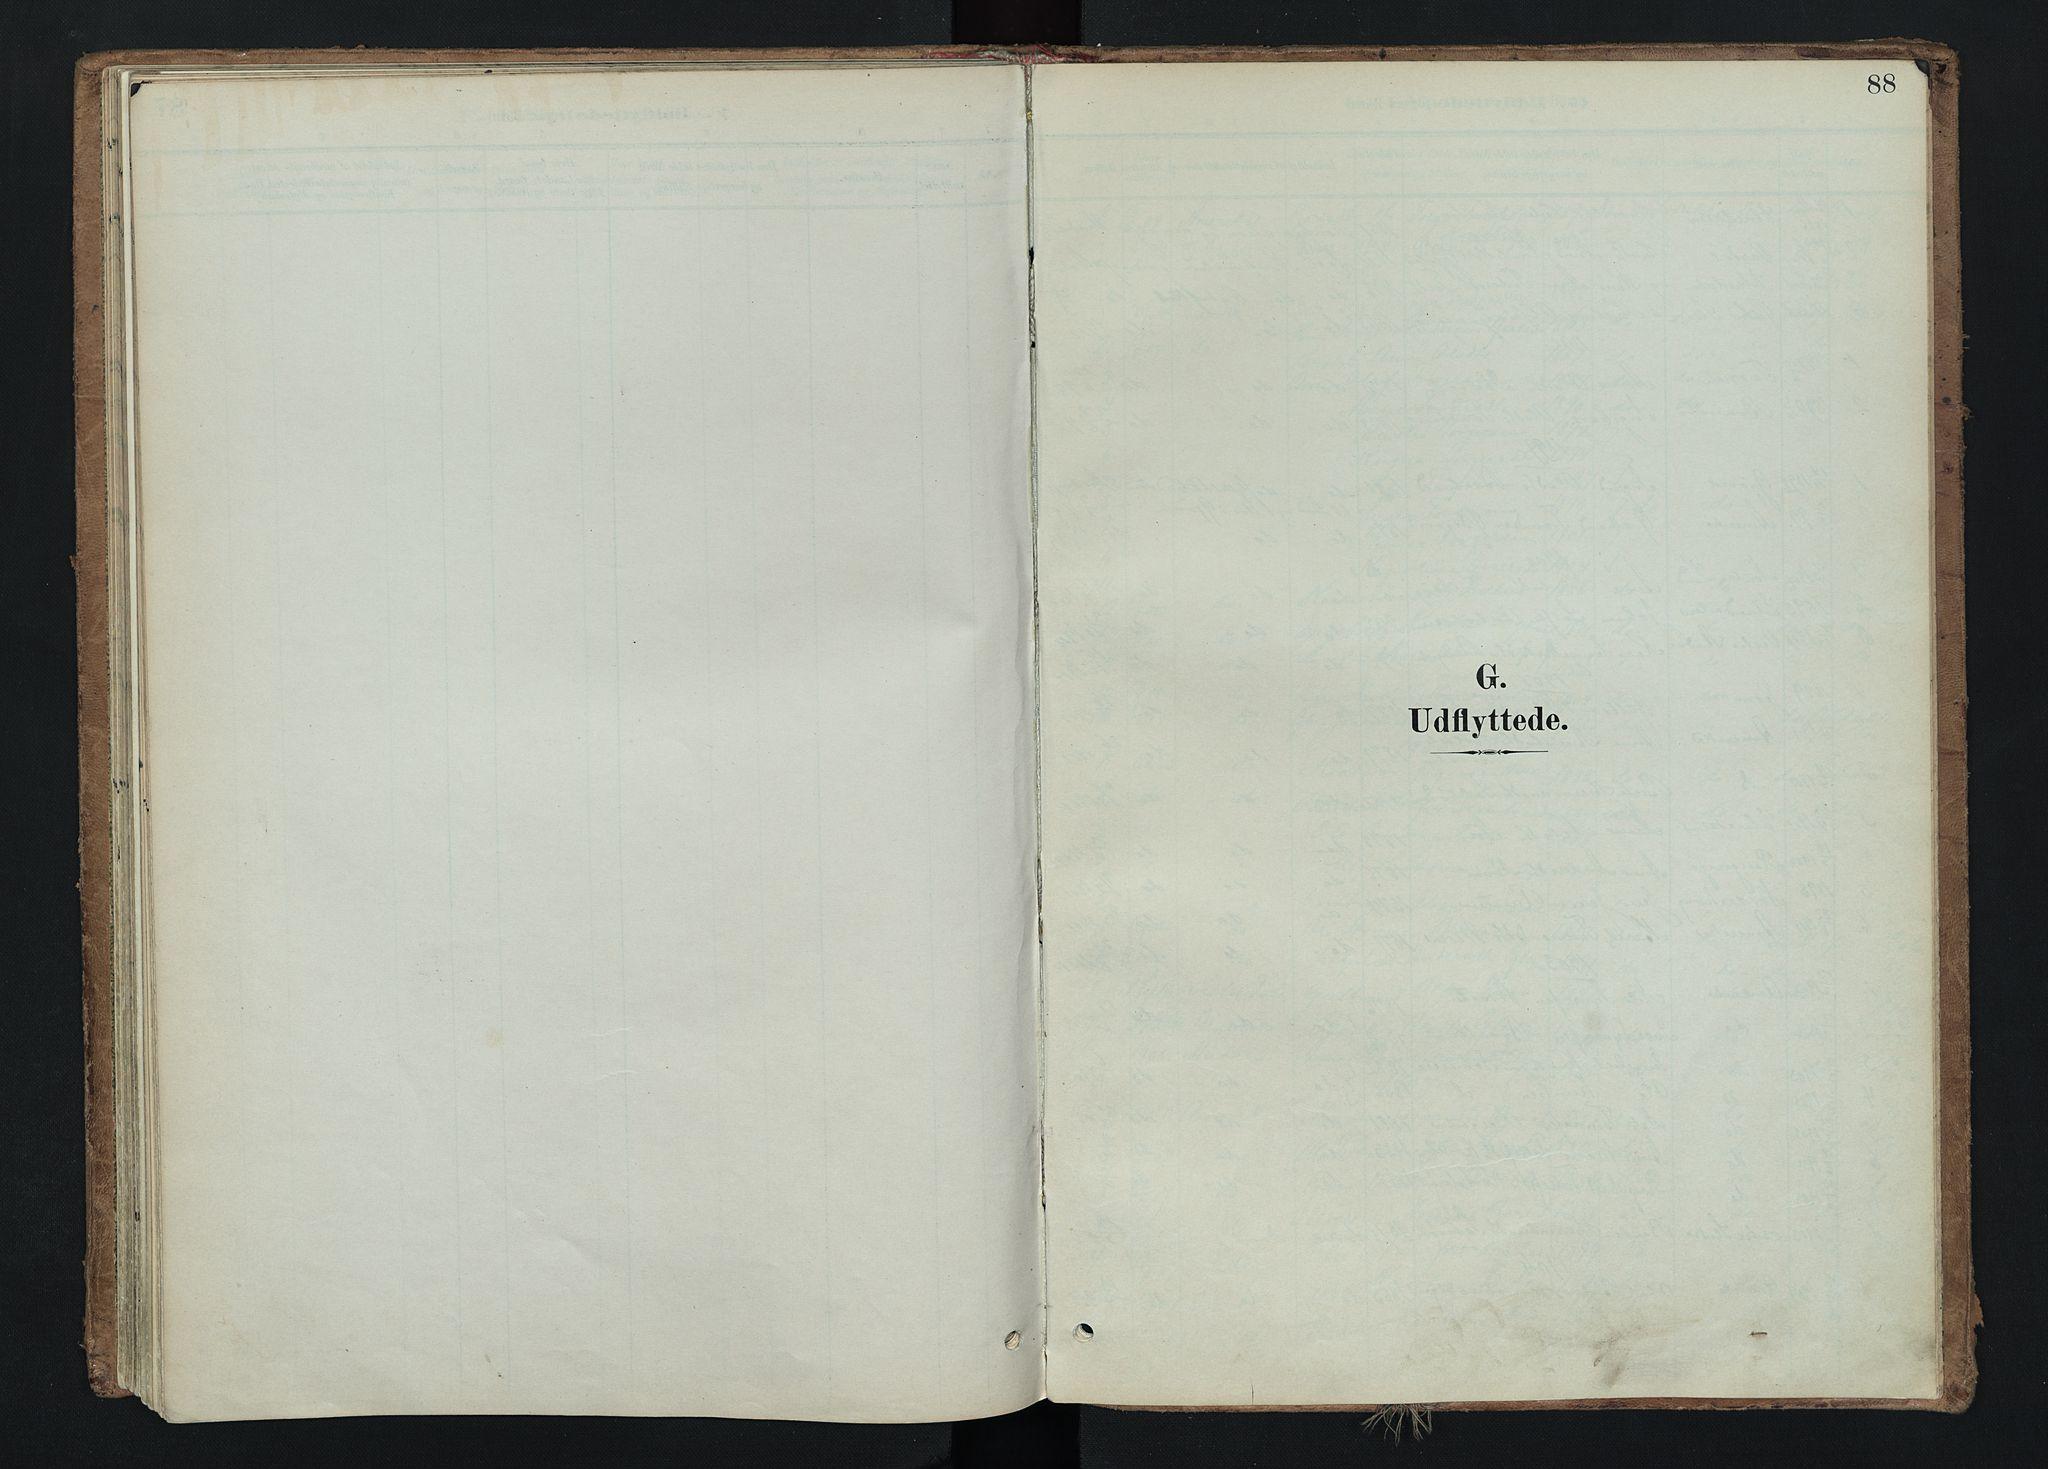 SAH, Nord-Aurdal prestekontor, Ministerialbok nr. 15, 1896-1914, s. 88